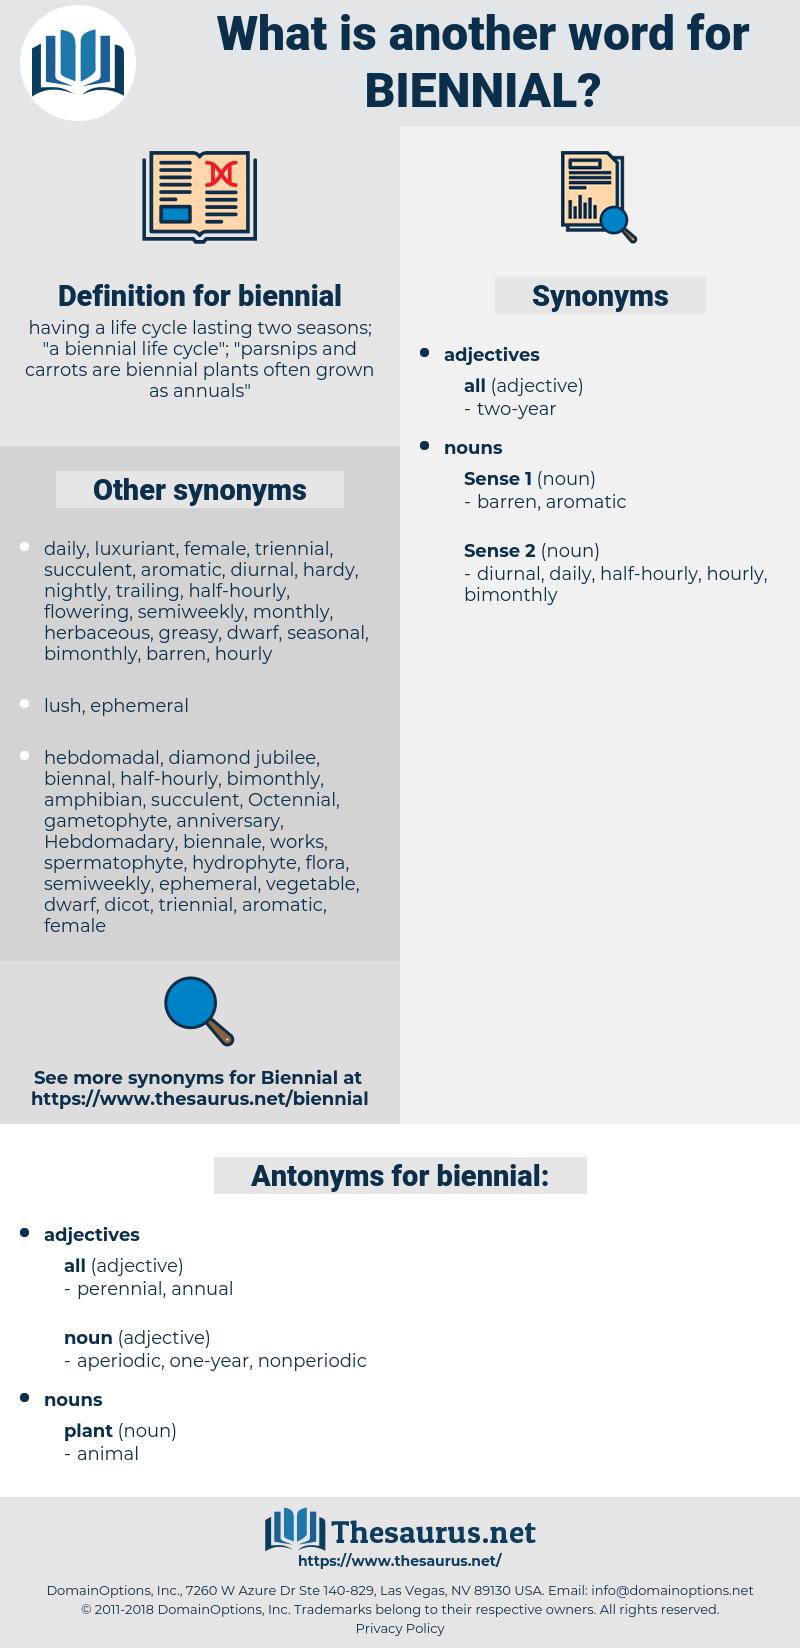 biennial, synonym biennial, another word for biennial, words like biennial, thesaurus biennial